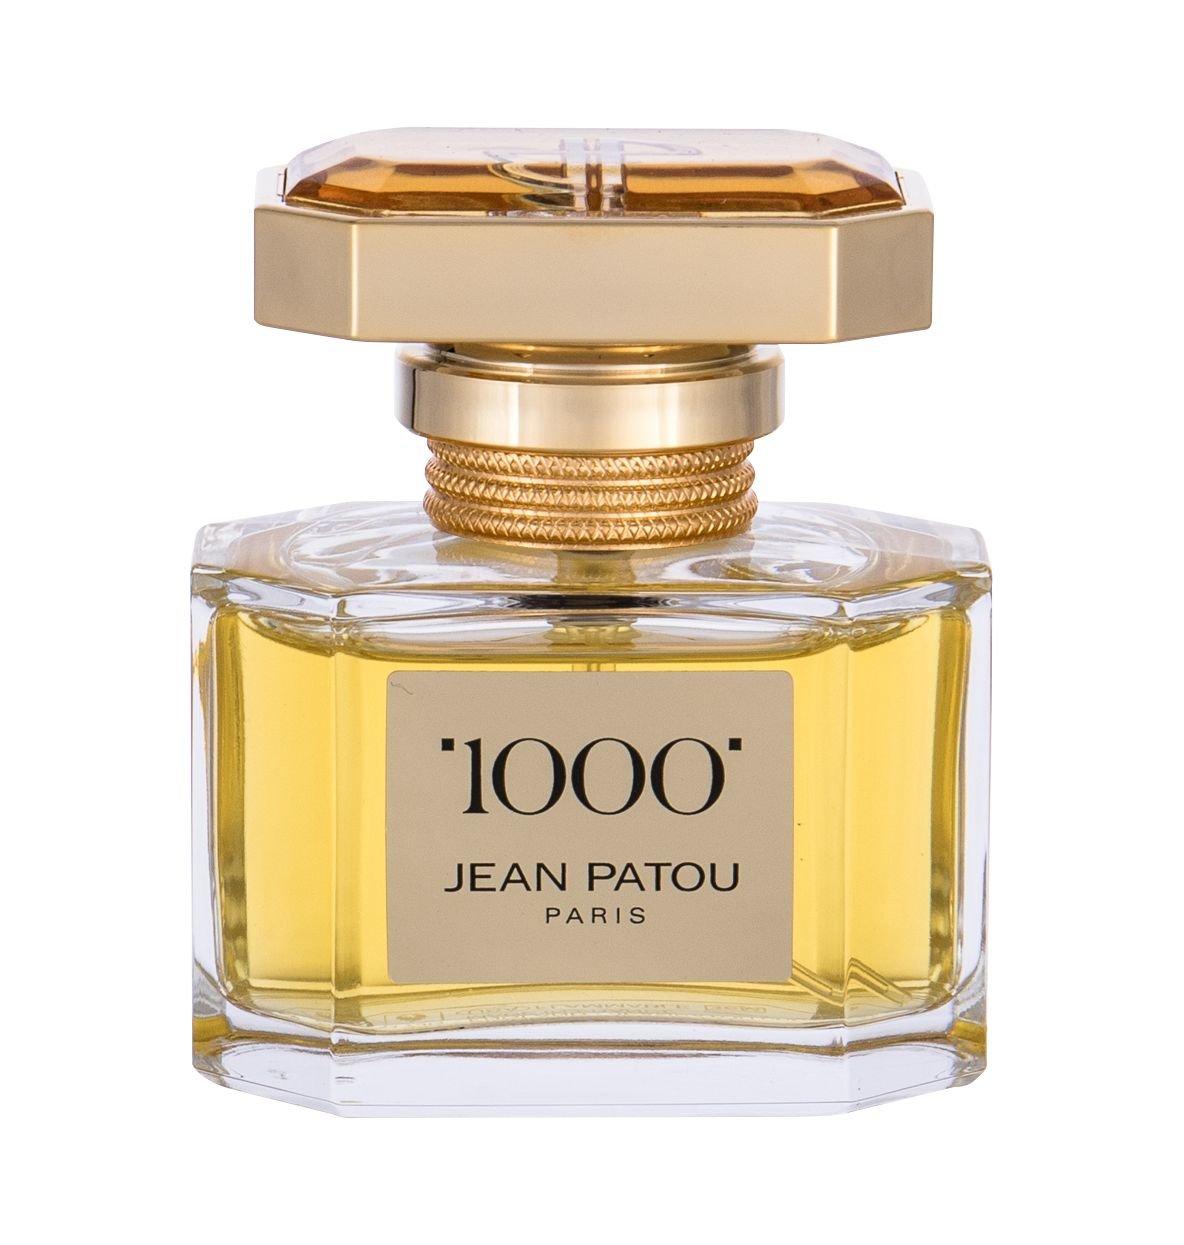 Jean Patou 1000 Eau de Toilette 30ml